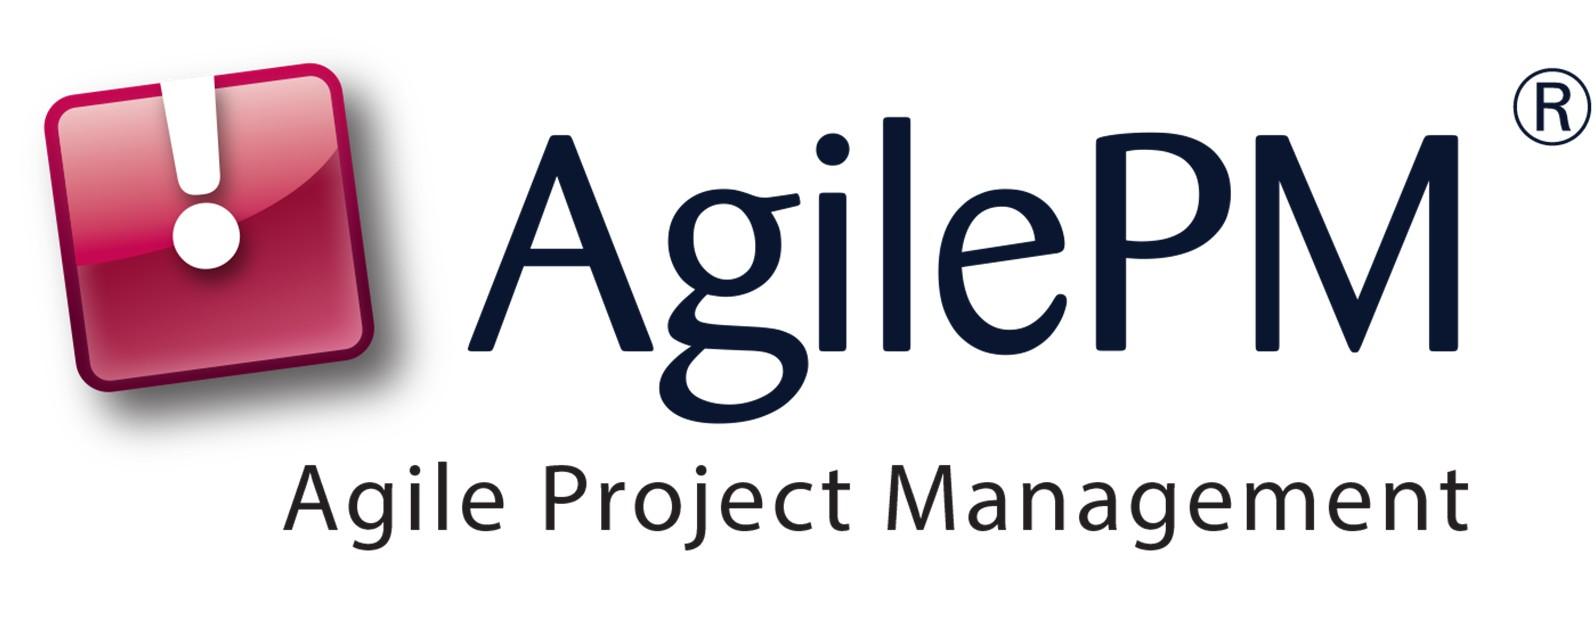 AgilePM Agile Project Manaagmernt - logo